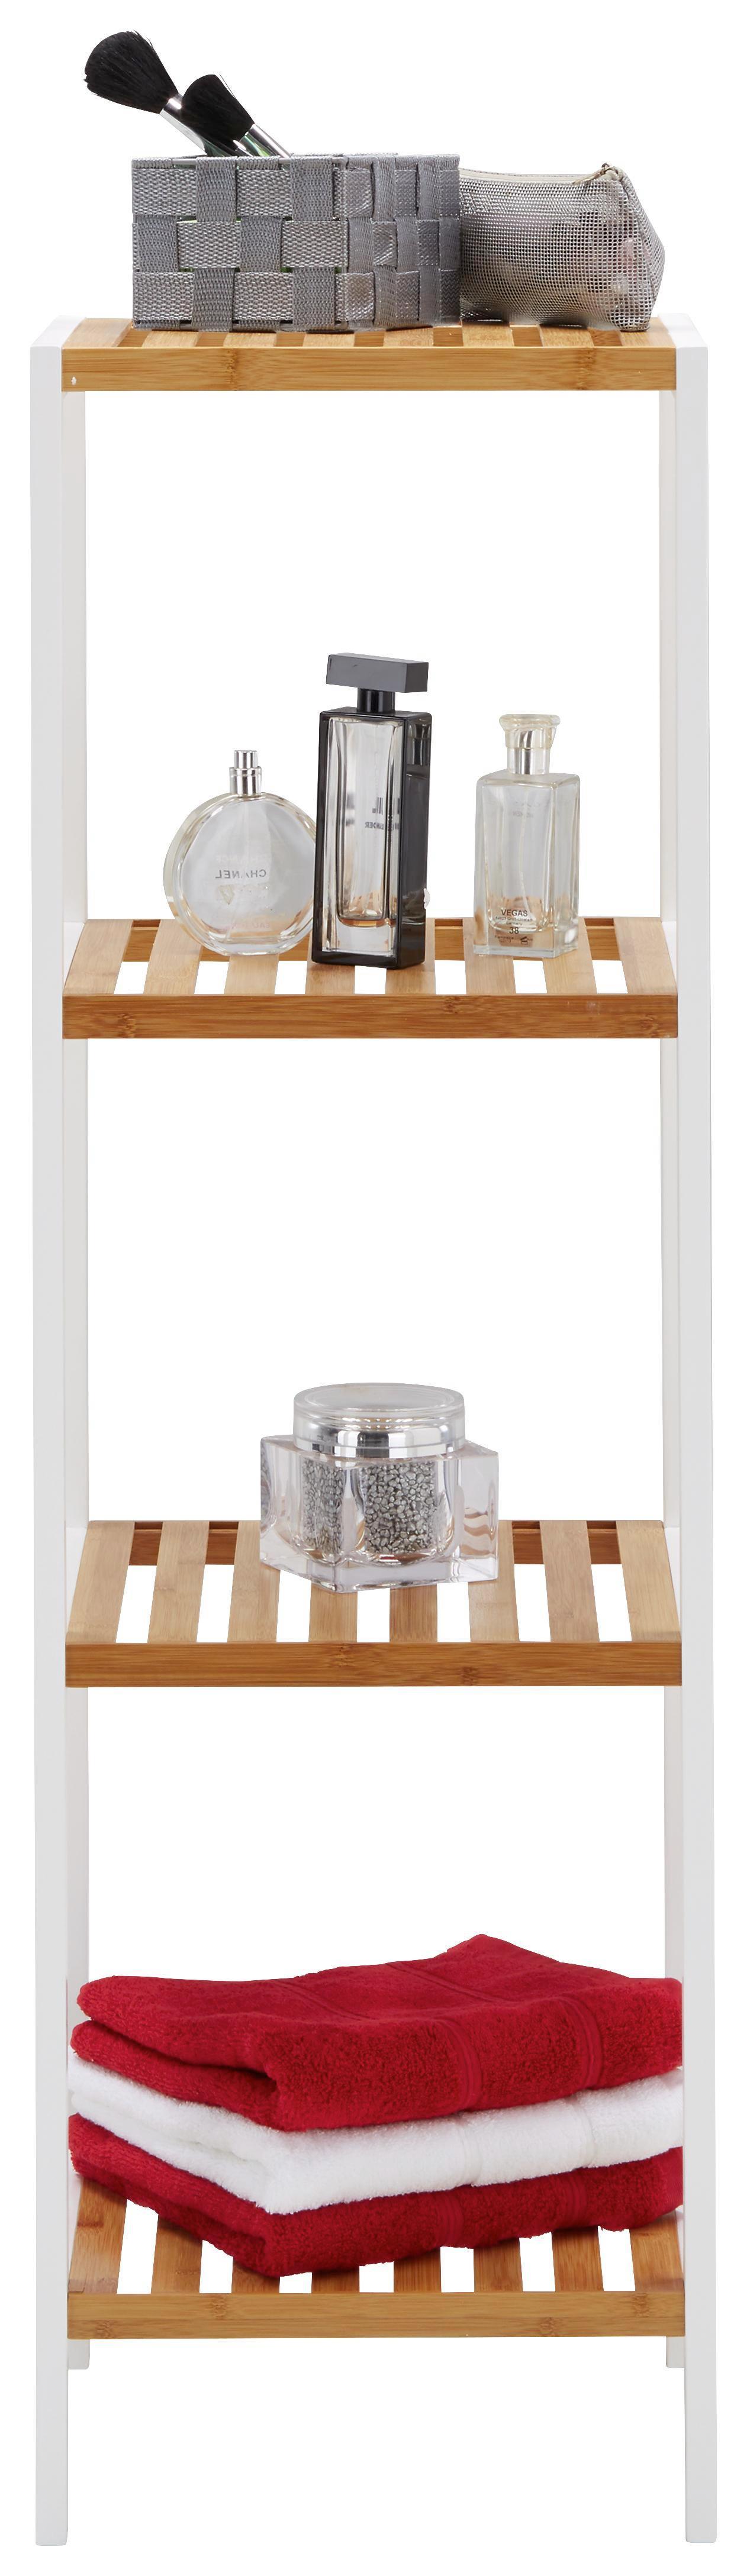 regal 20 cm tief ikea ikea besta regal xm with regal 20 cm tief ikea excellent medium size of. Black Bedroom Furniture Sets. Home Design Ideas